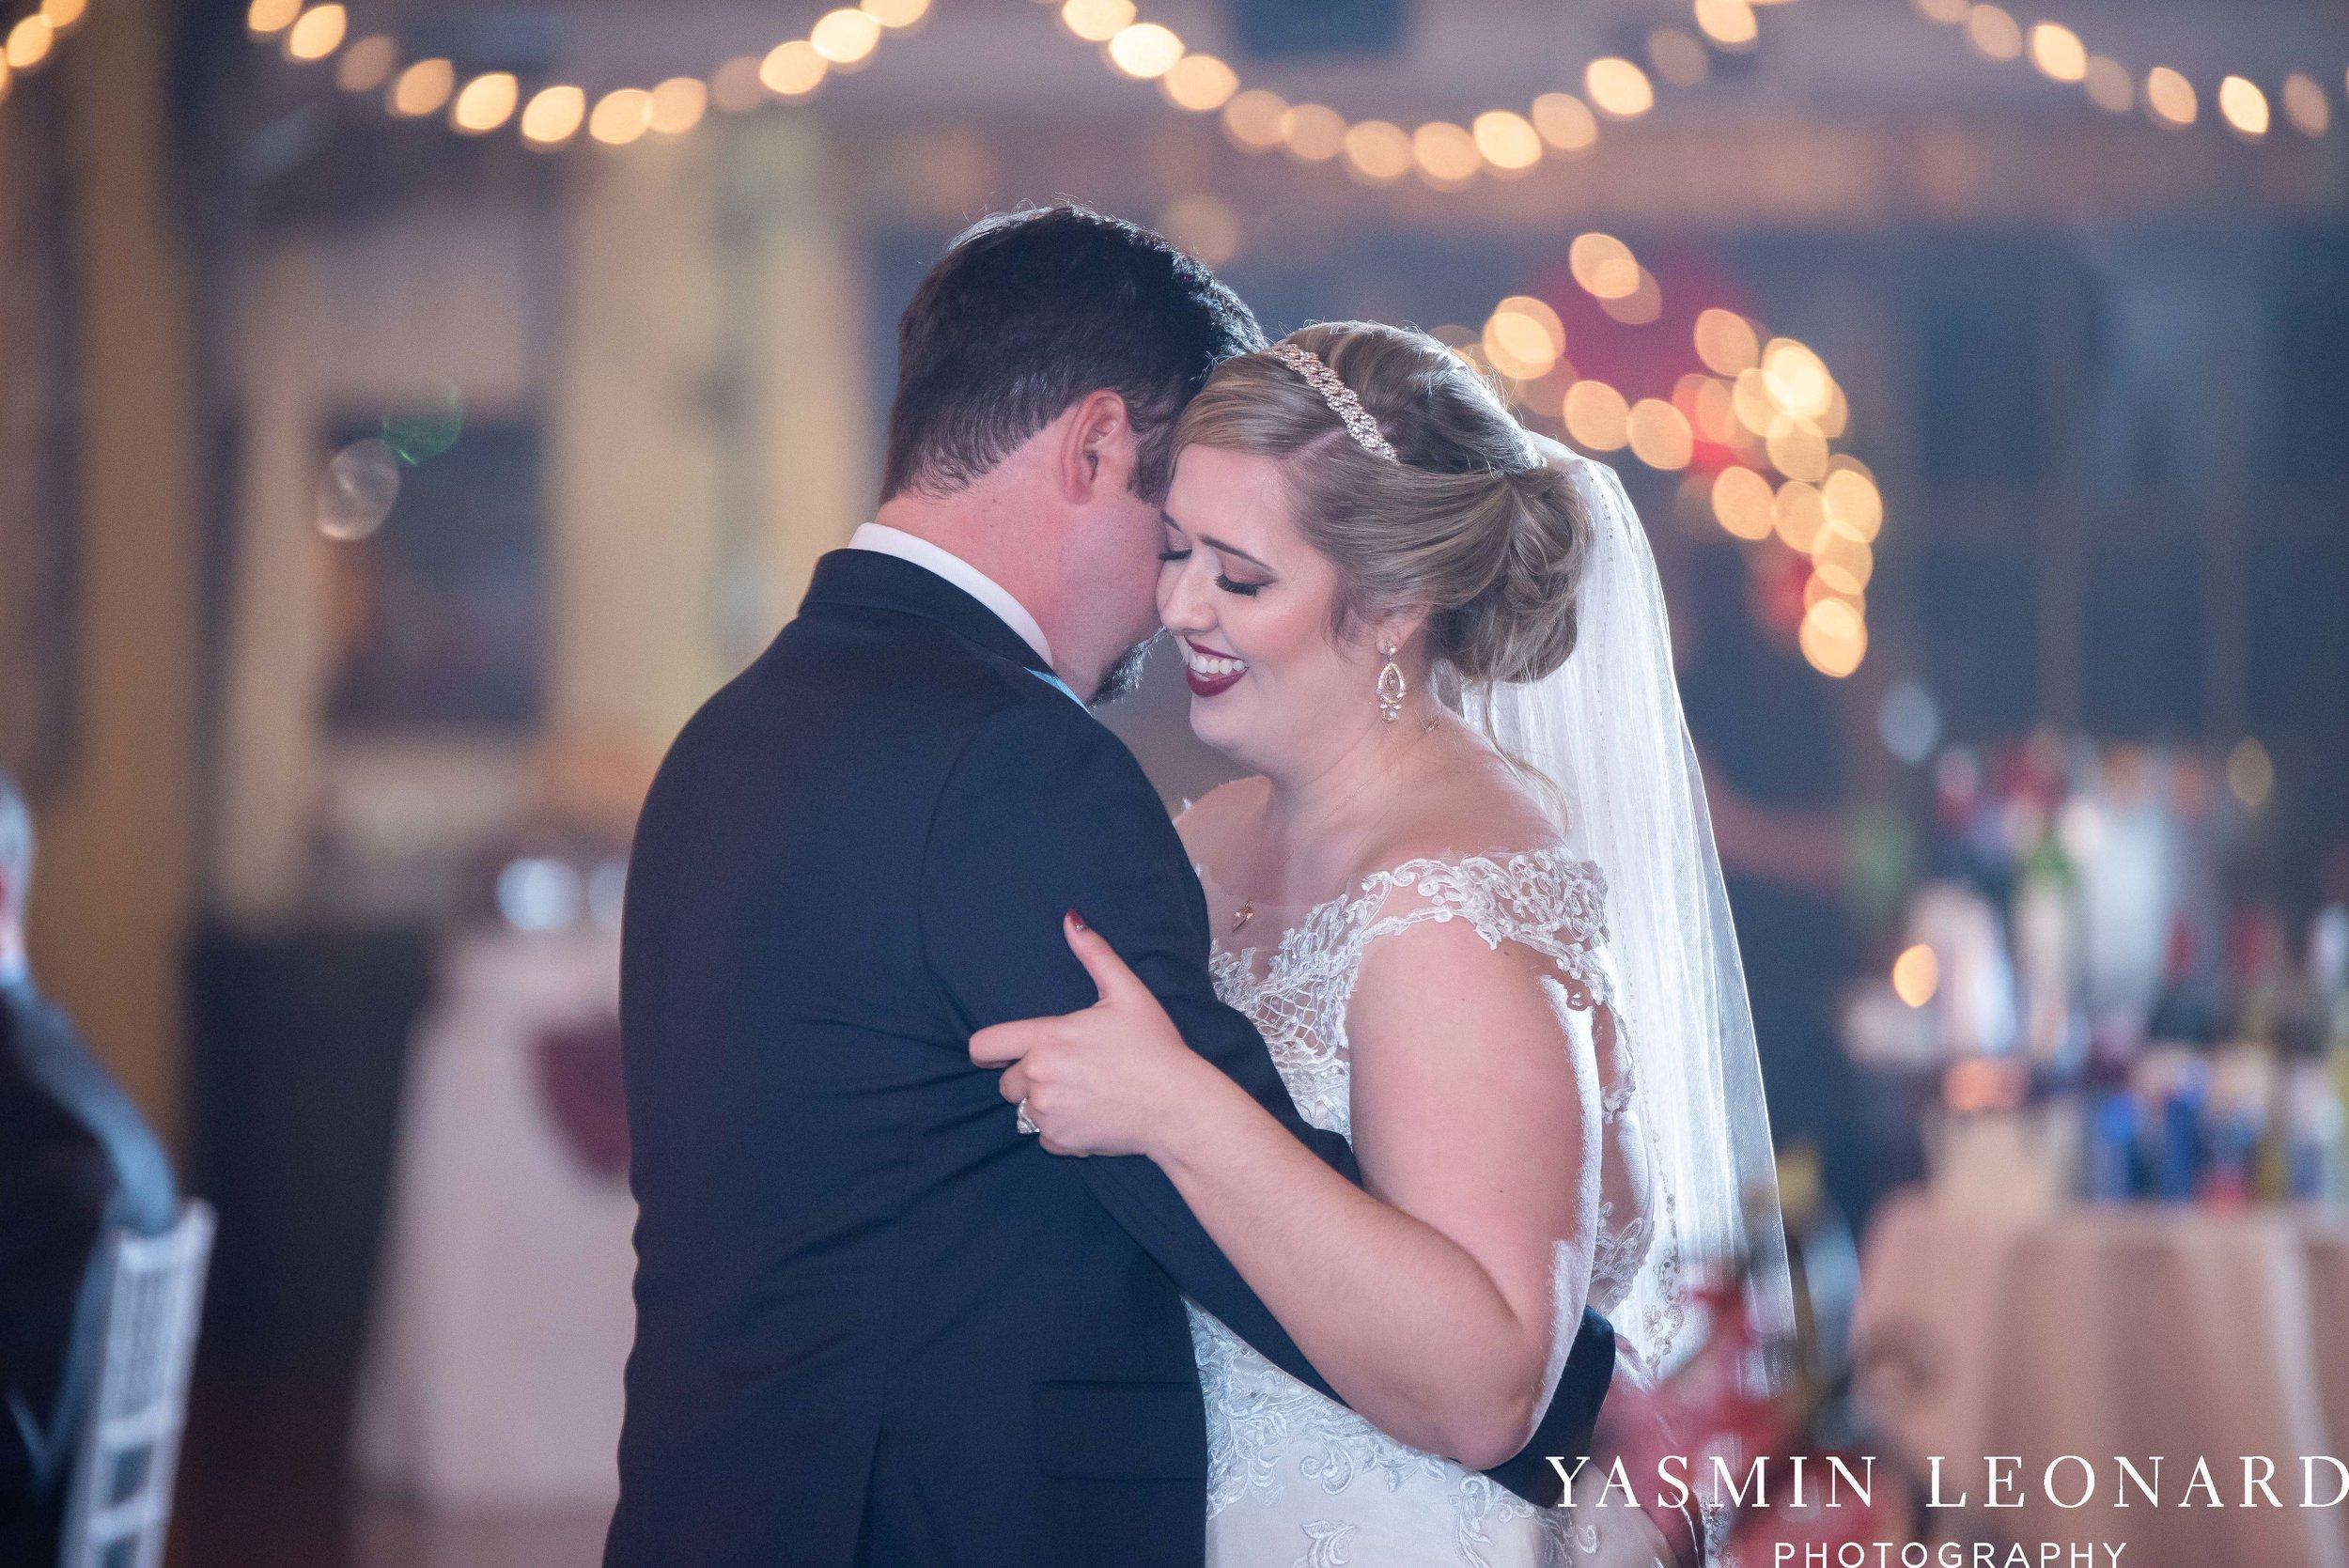 Rebekah and Matt - 105 Worth Event Centre - Yasmin Leonard Photography - Asheboro Wedding - NC Wedding - High Point Weddings - Triad Weddings - Winter Wedding-48.jpg